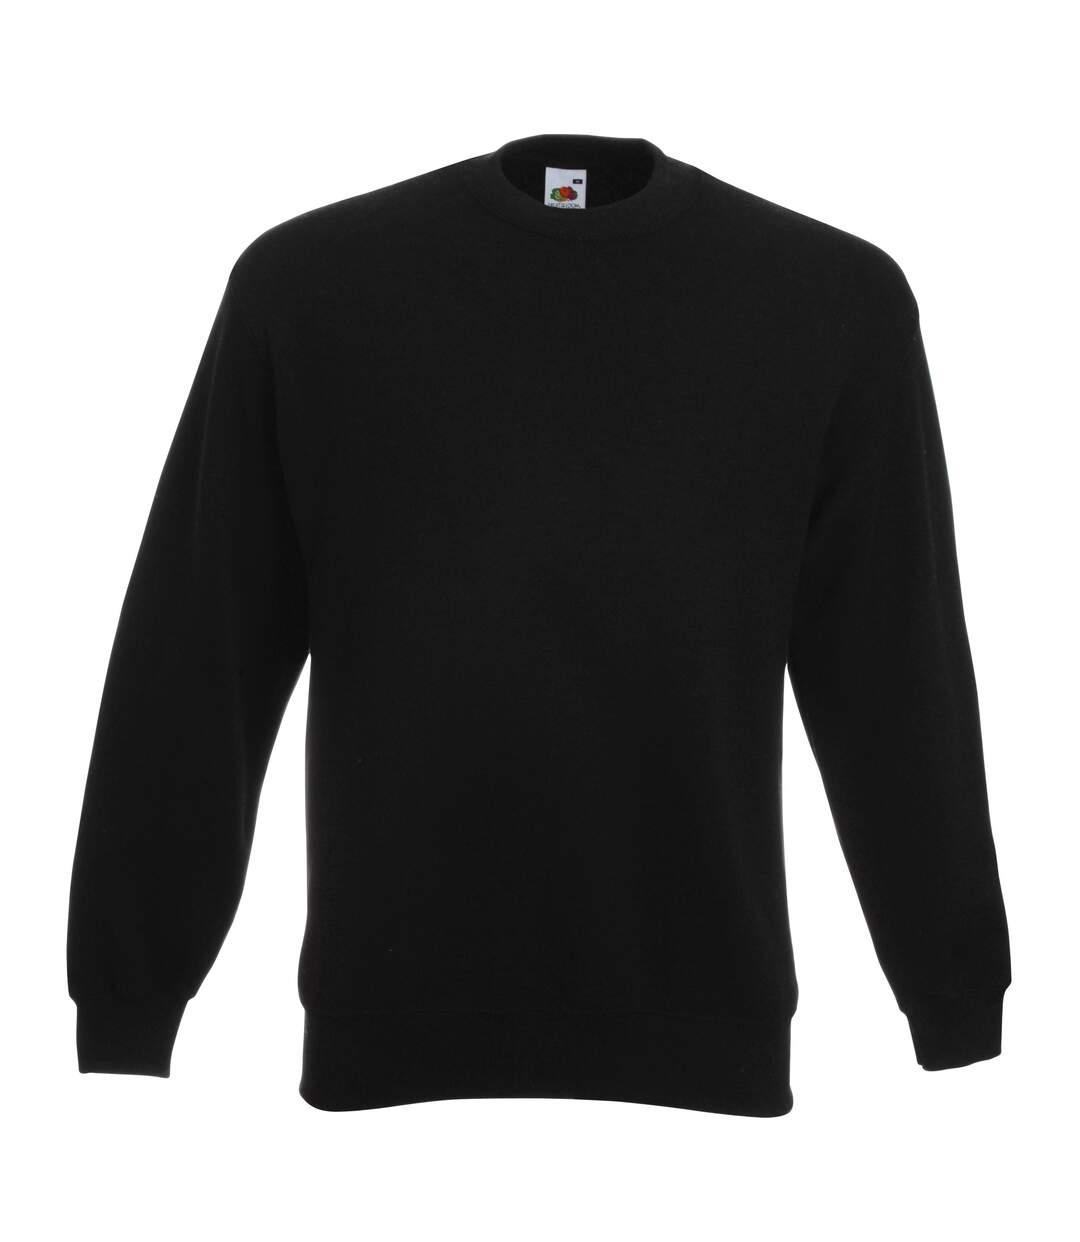 Fruit Of The Loom Unisex Premium 70/30 Set-In Sweatshirt (Chocolate) - UTRW3159